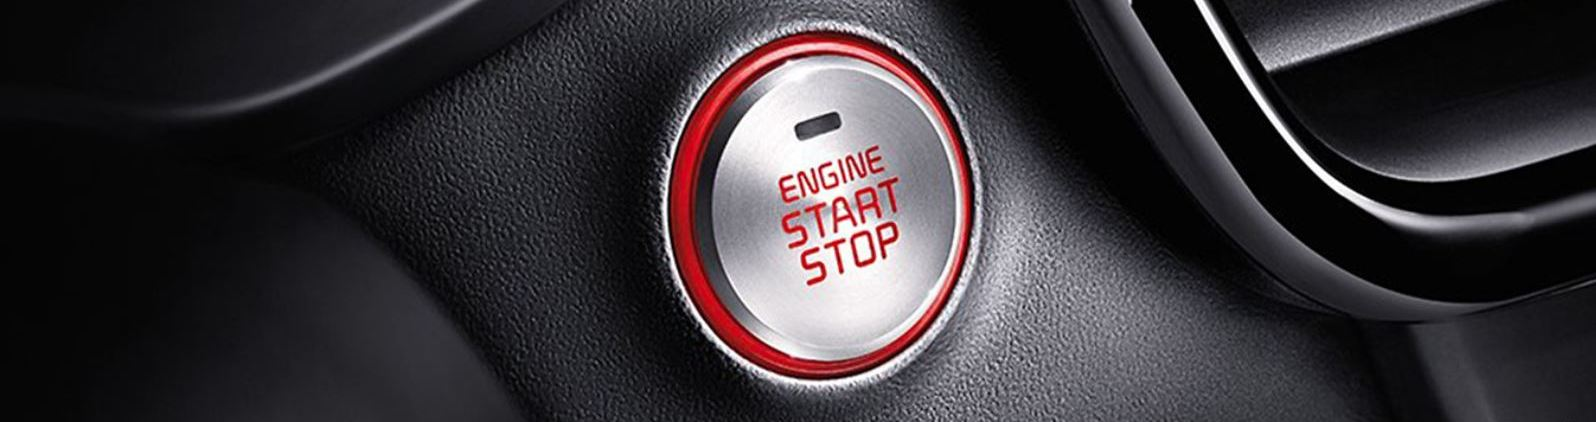 Push-Button Start in the 2020 Kia Optima